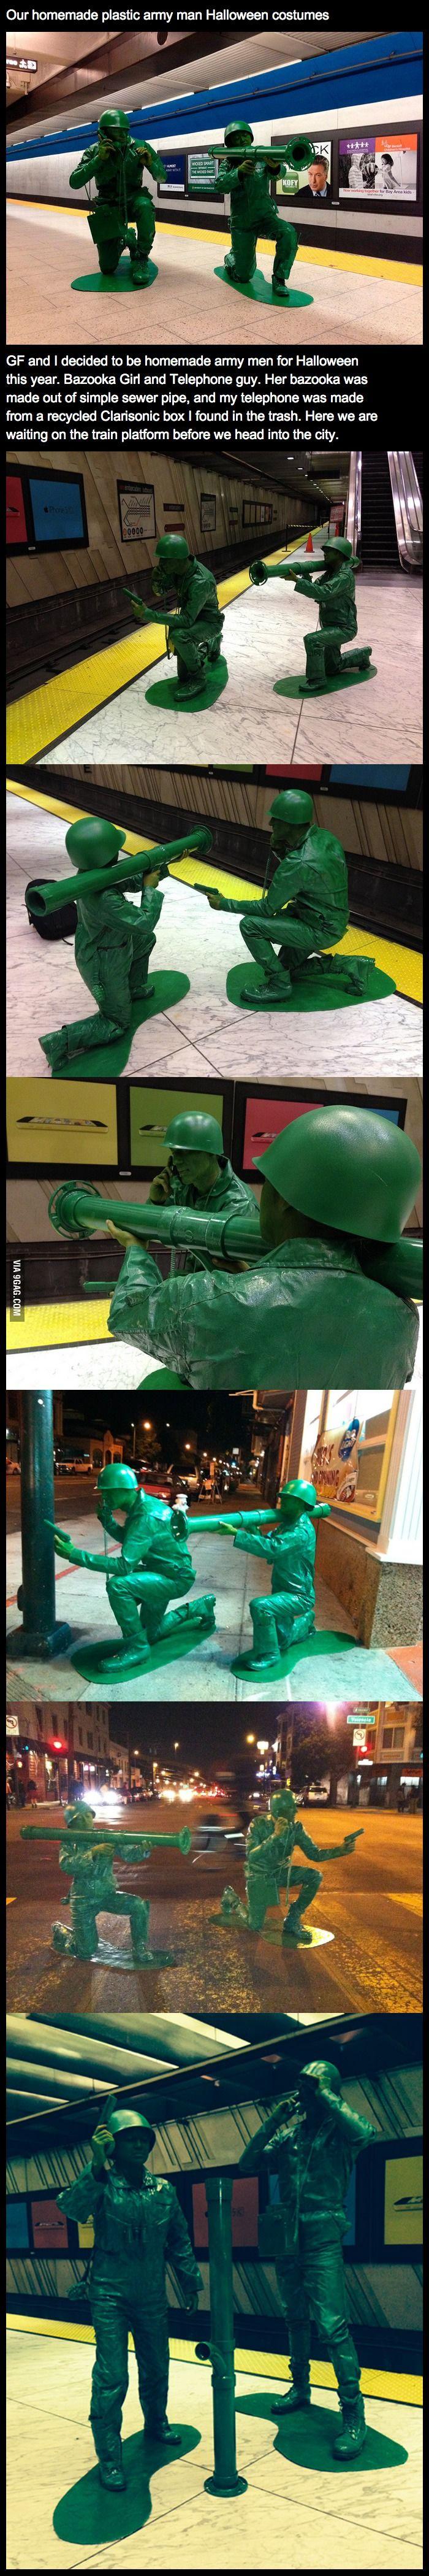 Girlfriend and boyfriend went as plastic army men